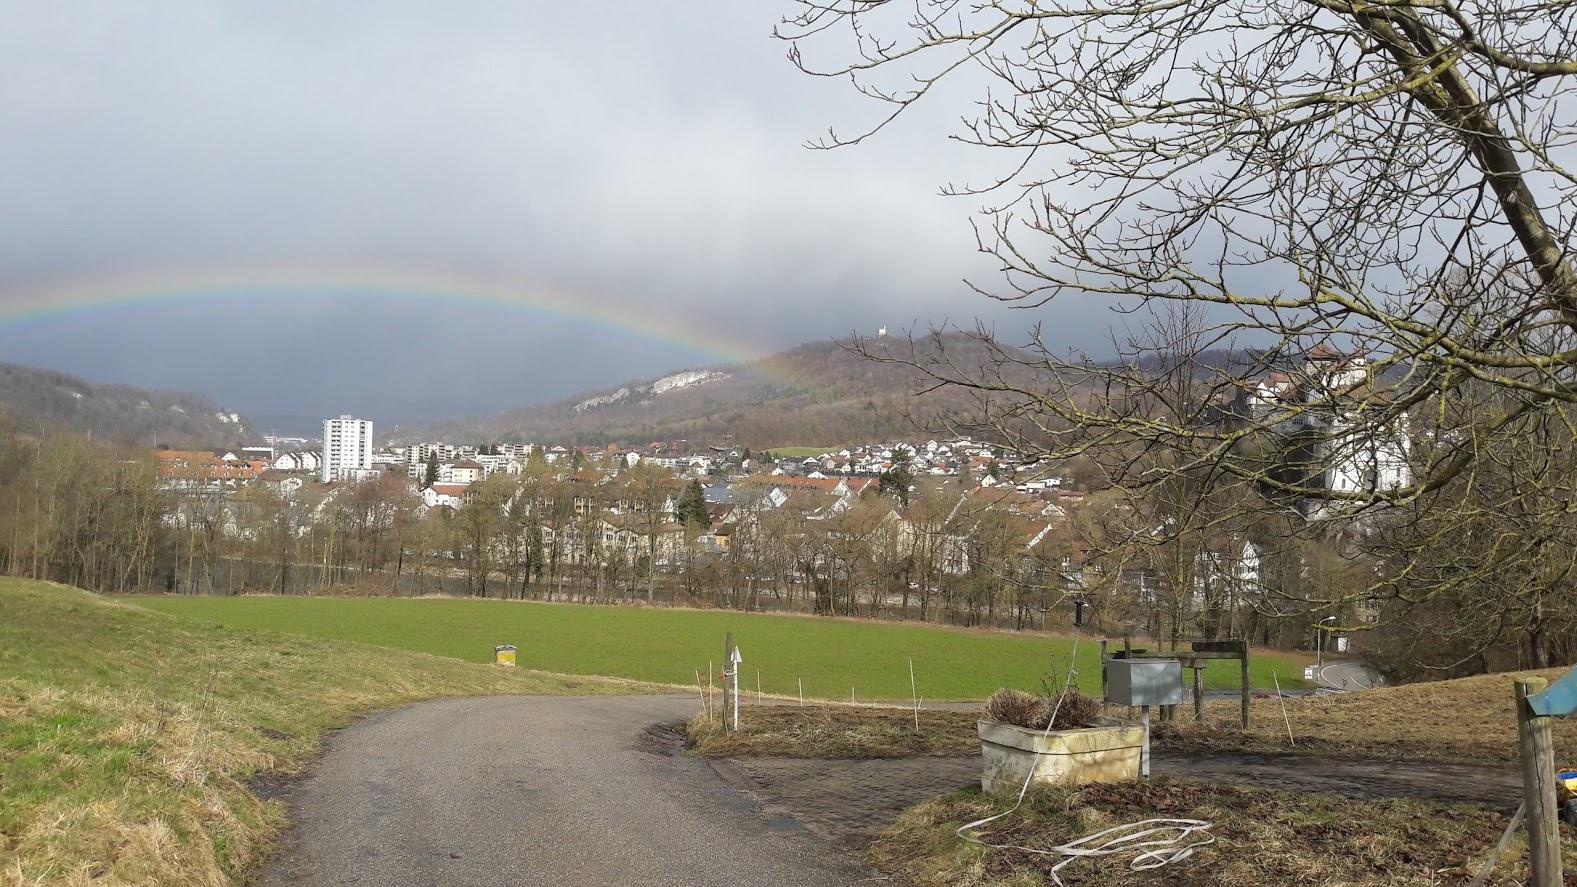 Sektion Wandern - Aarburg / Olten - 07.03.2018